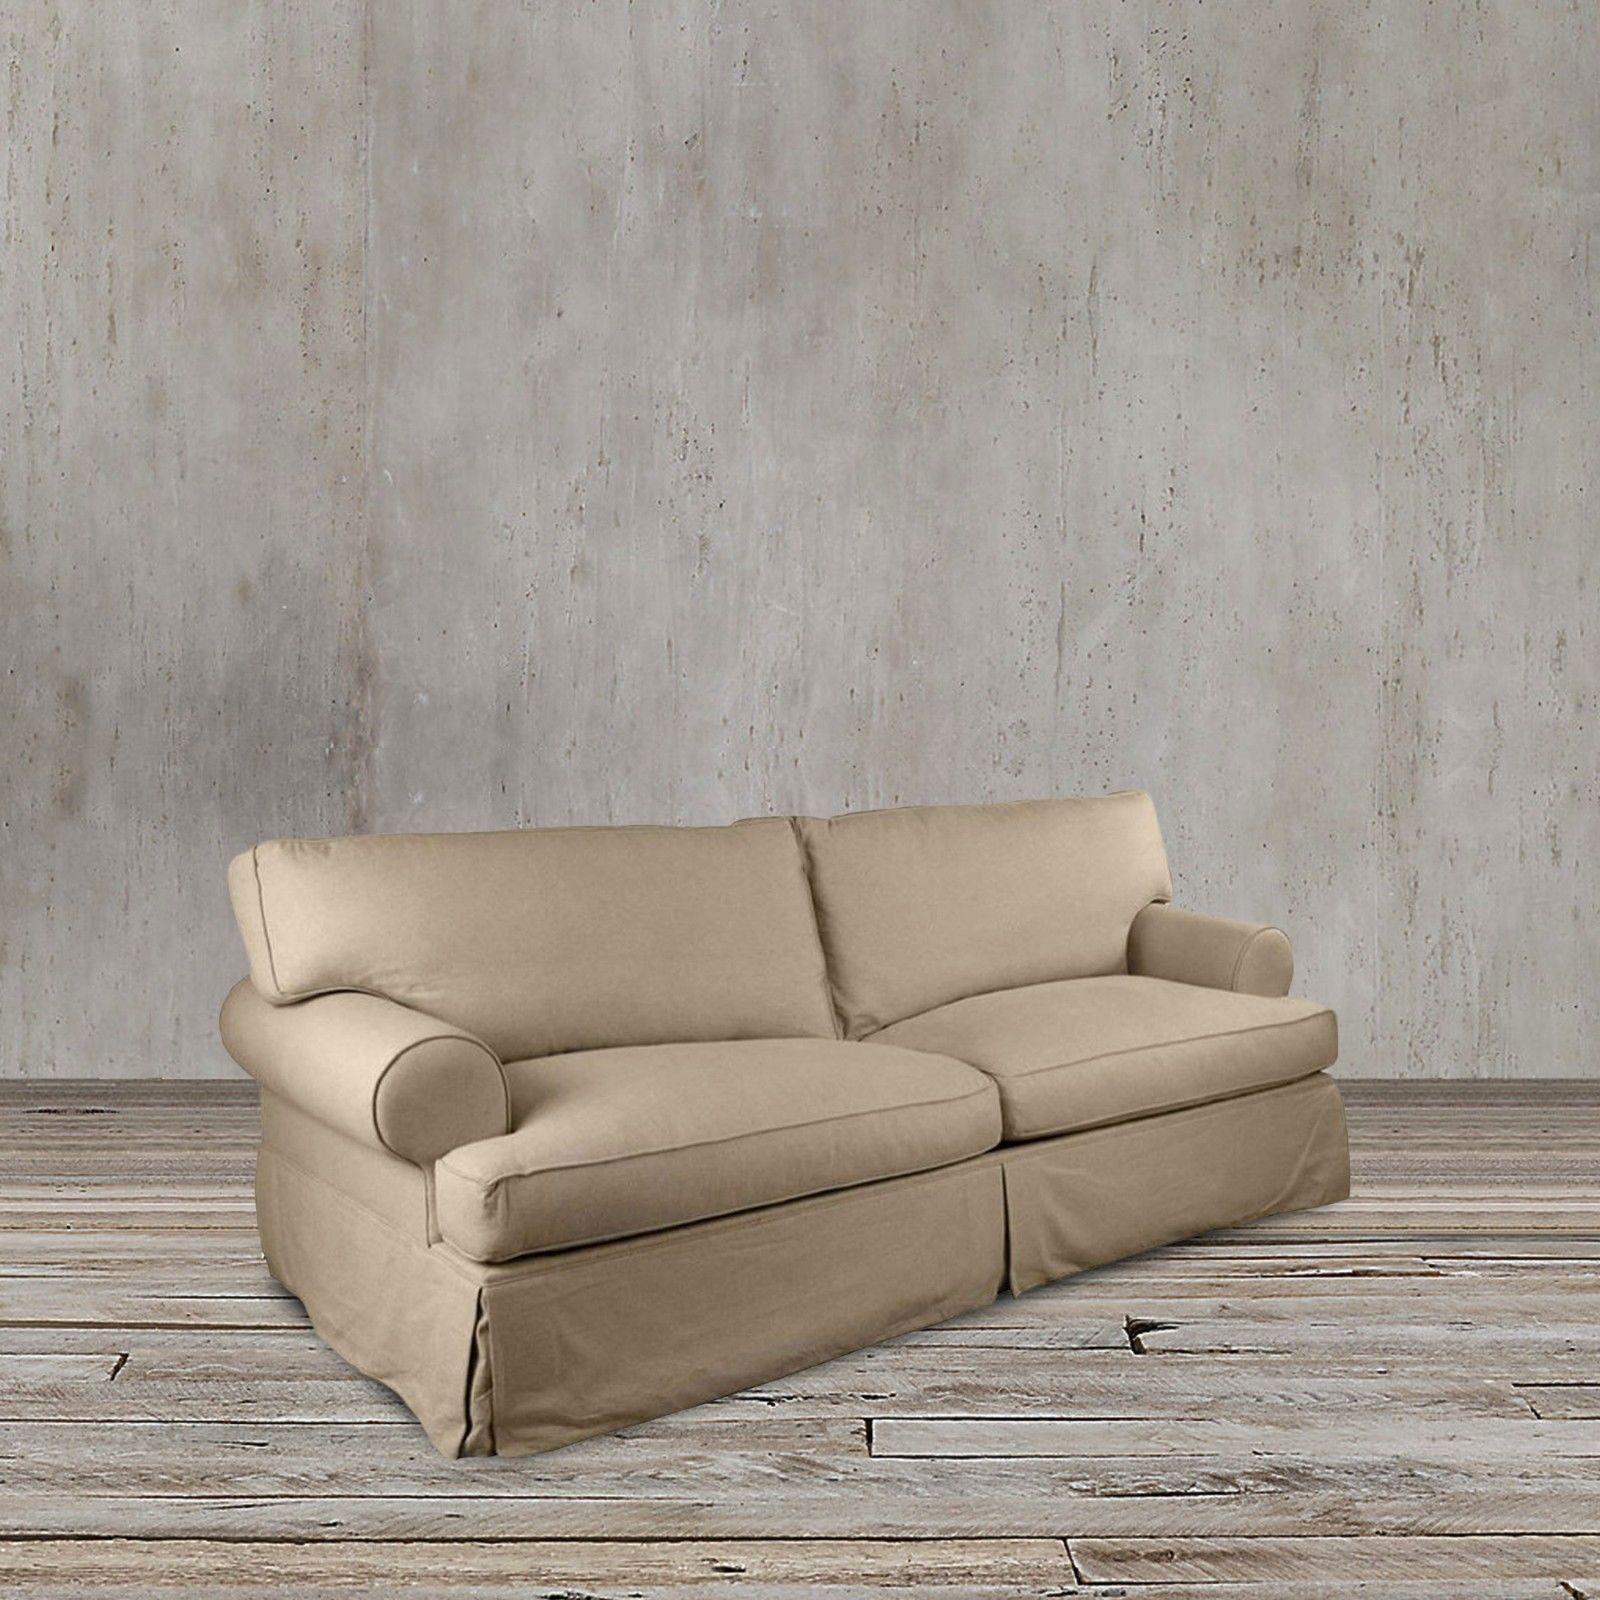 Tan Beige Sand Colored Slipcover Sofa